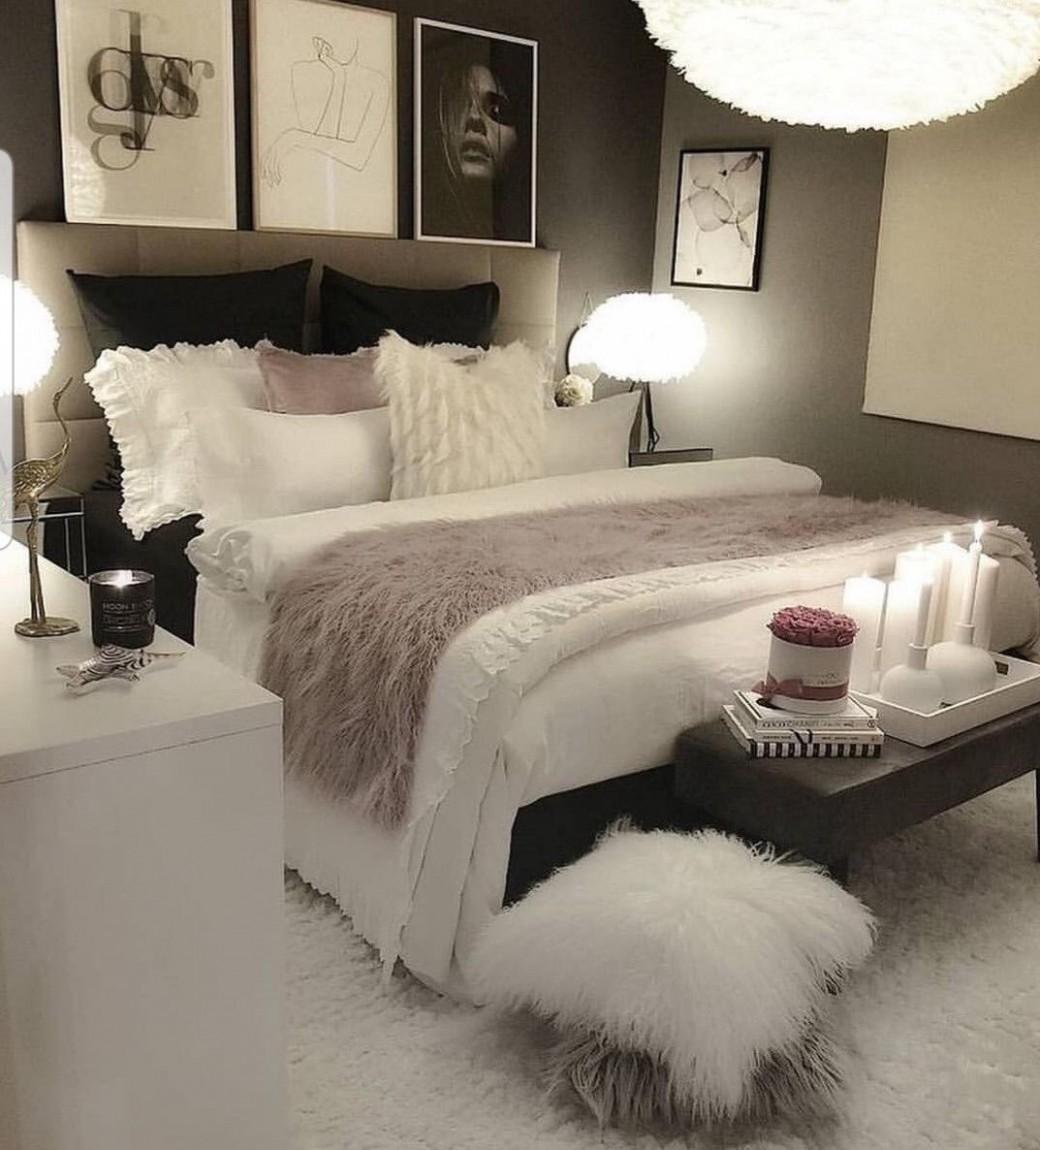 BabyyyGirllll beach / luxury / rich  White bedroom decor  - Bedroom Ideas Ebay